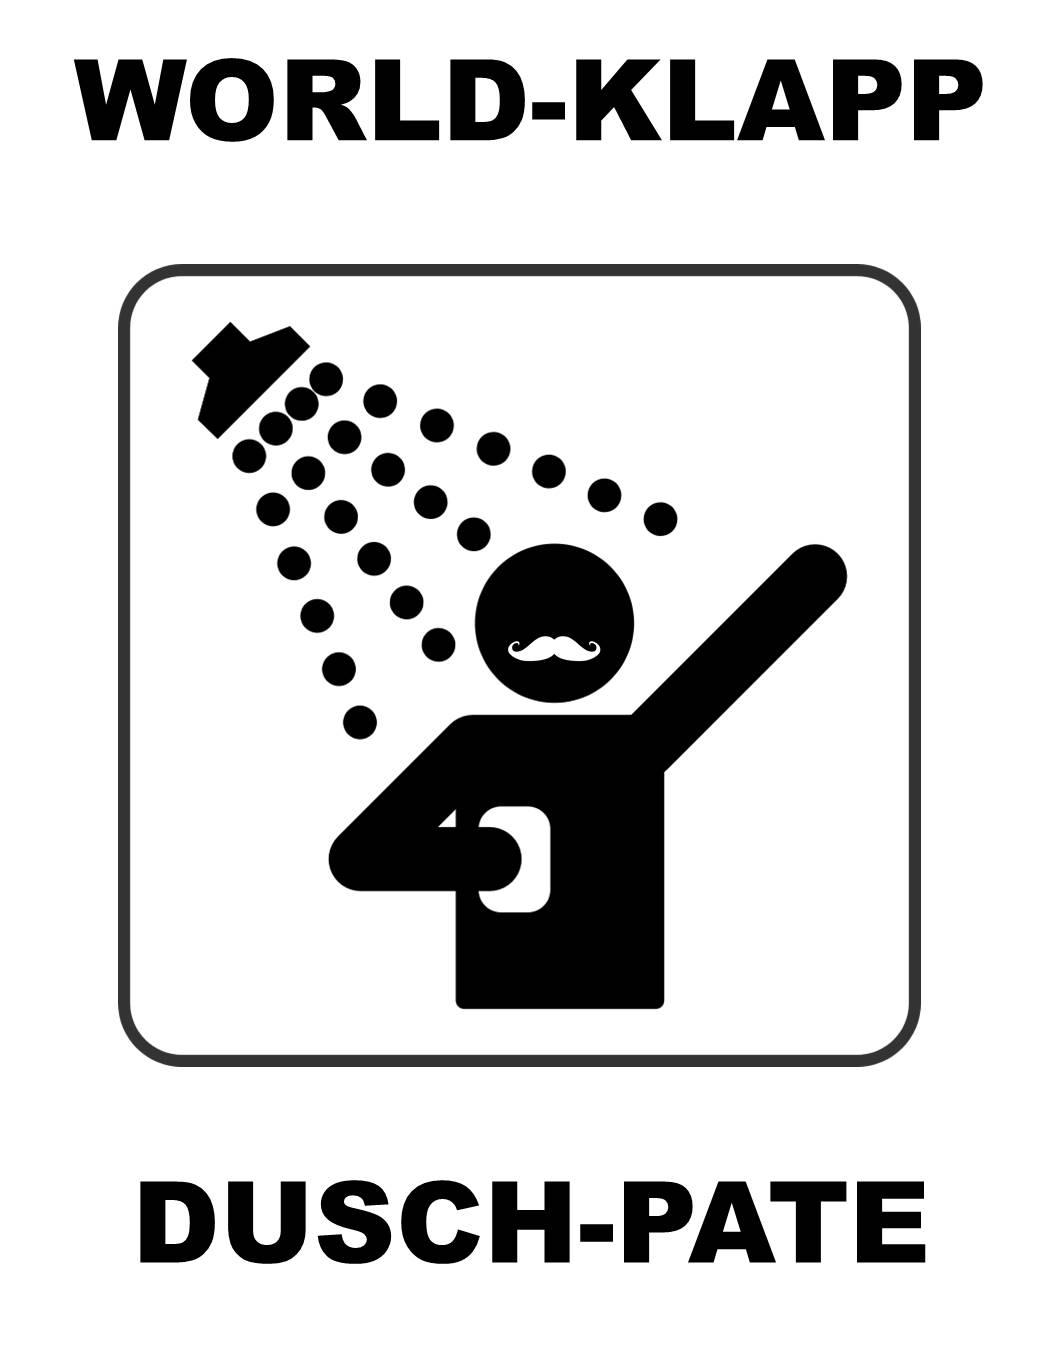 World-Klapp Dusch-Pate